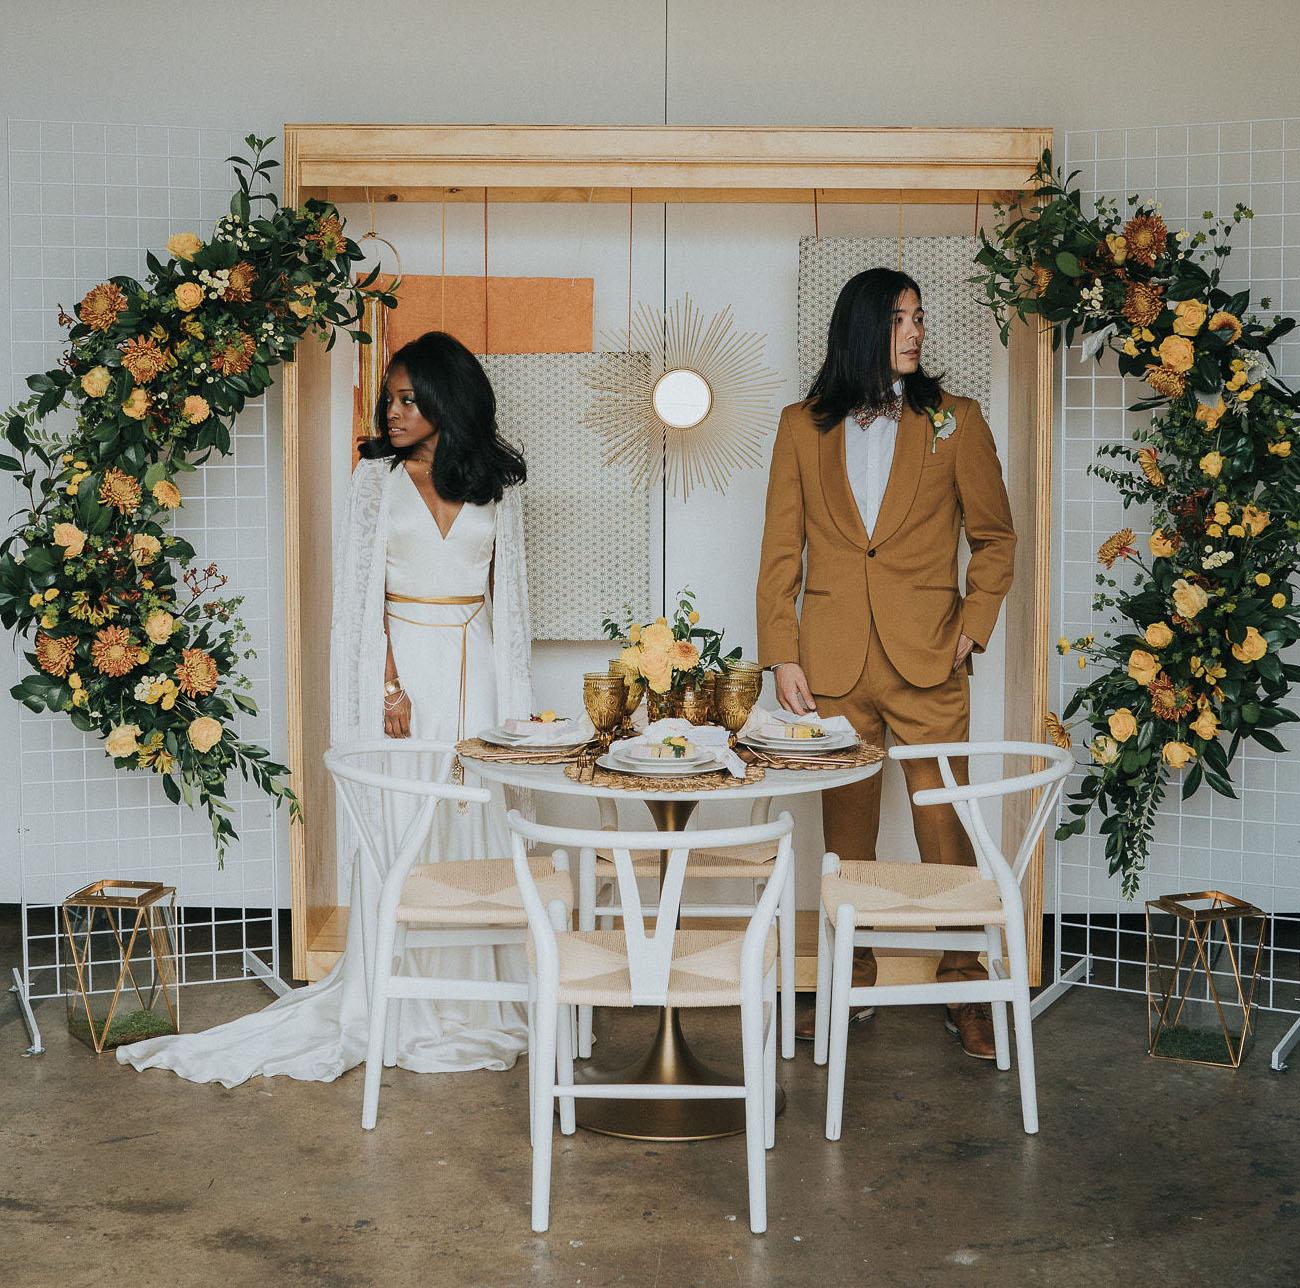 Monochrome 70s Wedding Inspiration